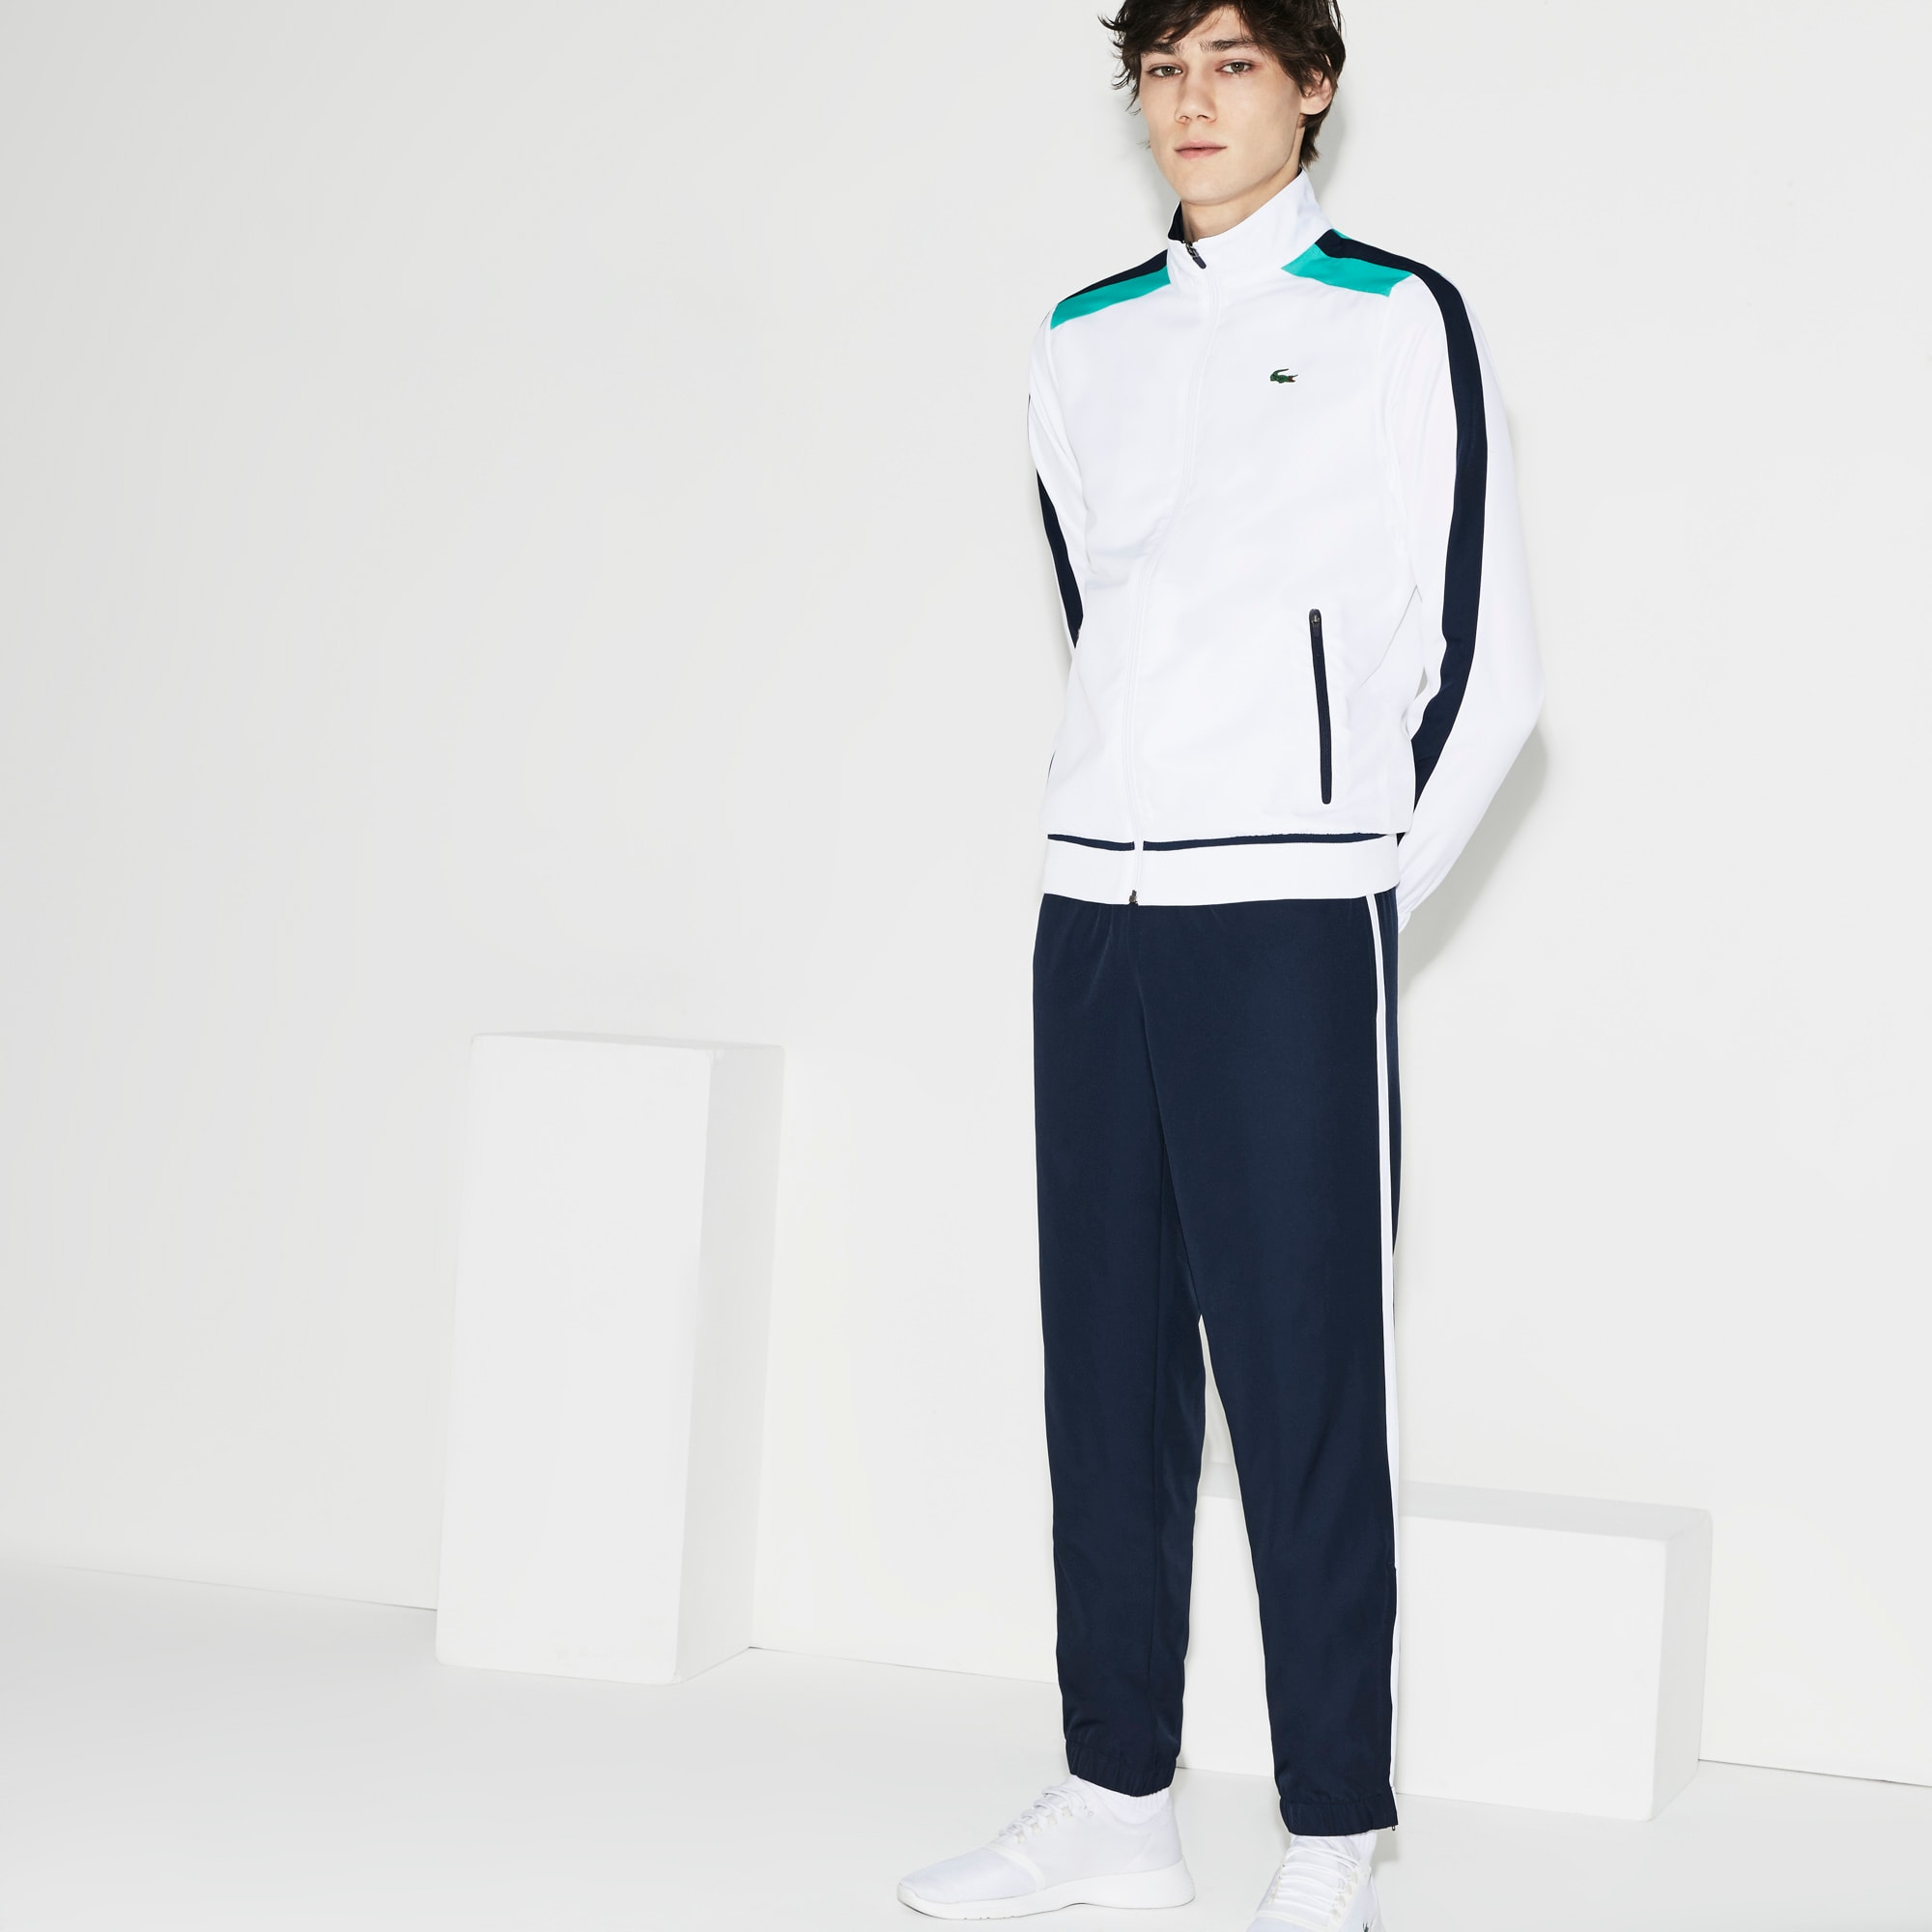 Chándal de hombre Lacoste SPORT Tennis en tafetán con franjas de colores